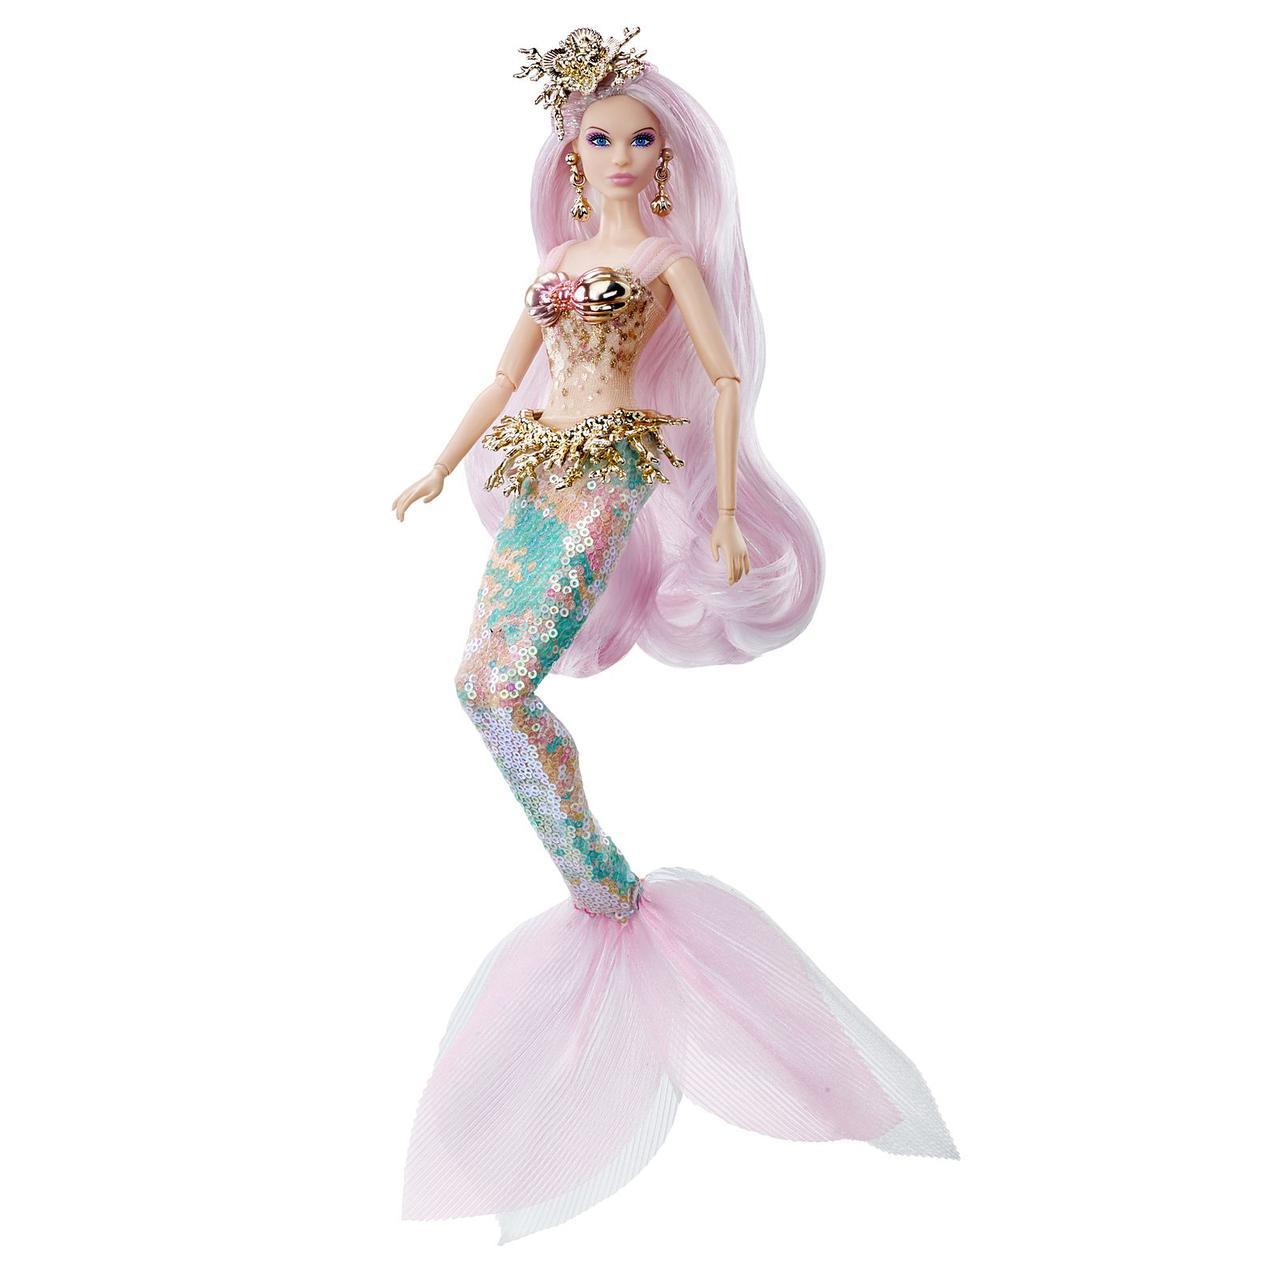 Кукла Барби коллекционная Русалка Волшебница